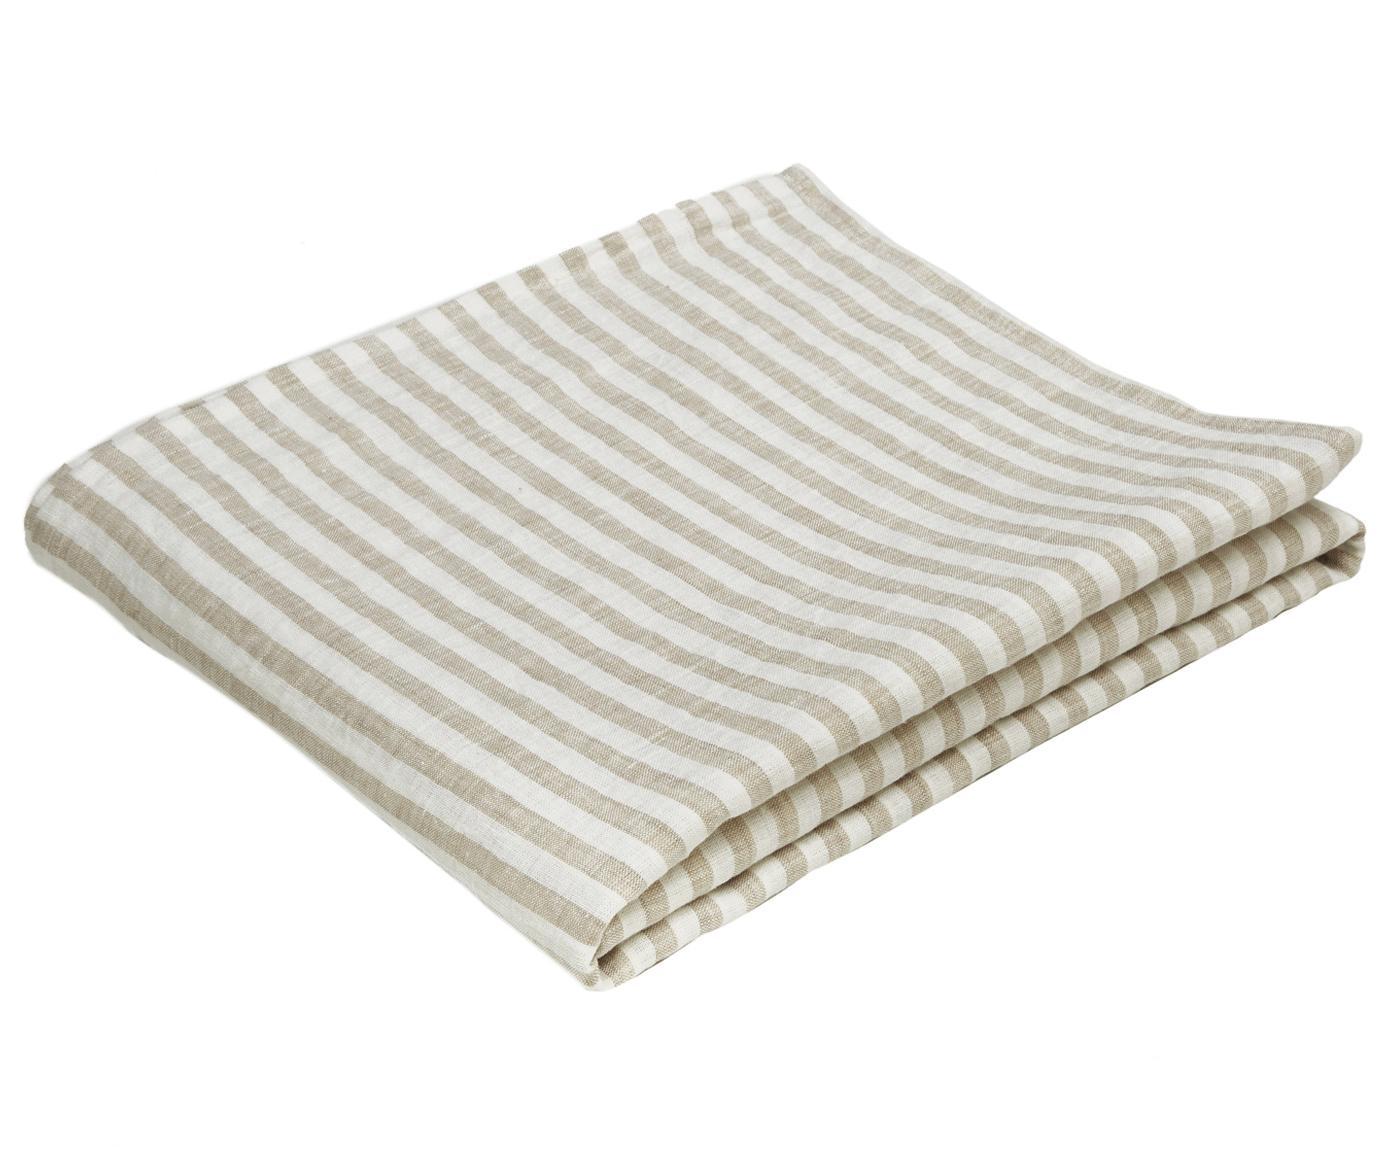 Mantel de lino Solami, Lino, Beige, blanco, De 6 a 8 comensales (An 150 x L 250 cm)